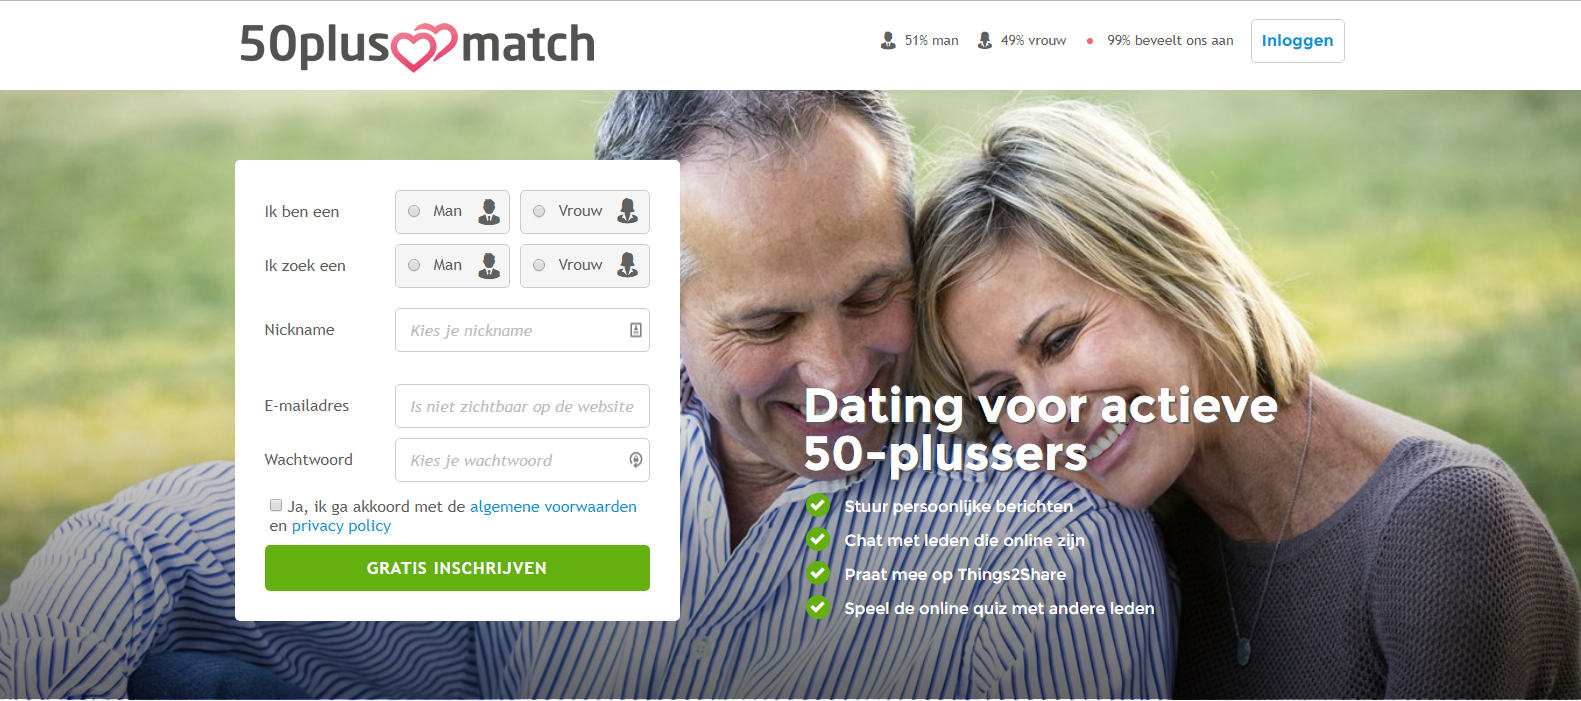 Gratis ondergrondse dating sites